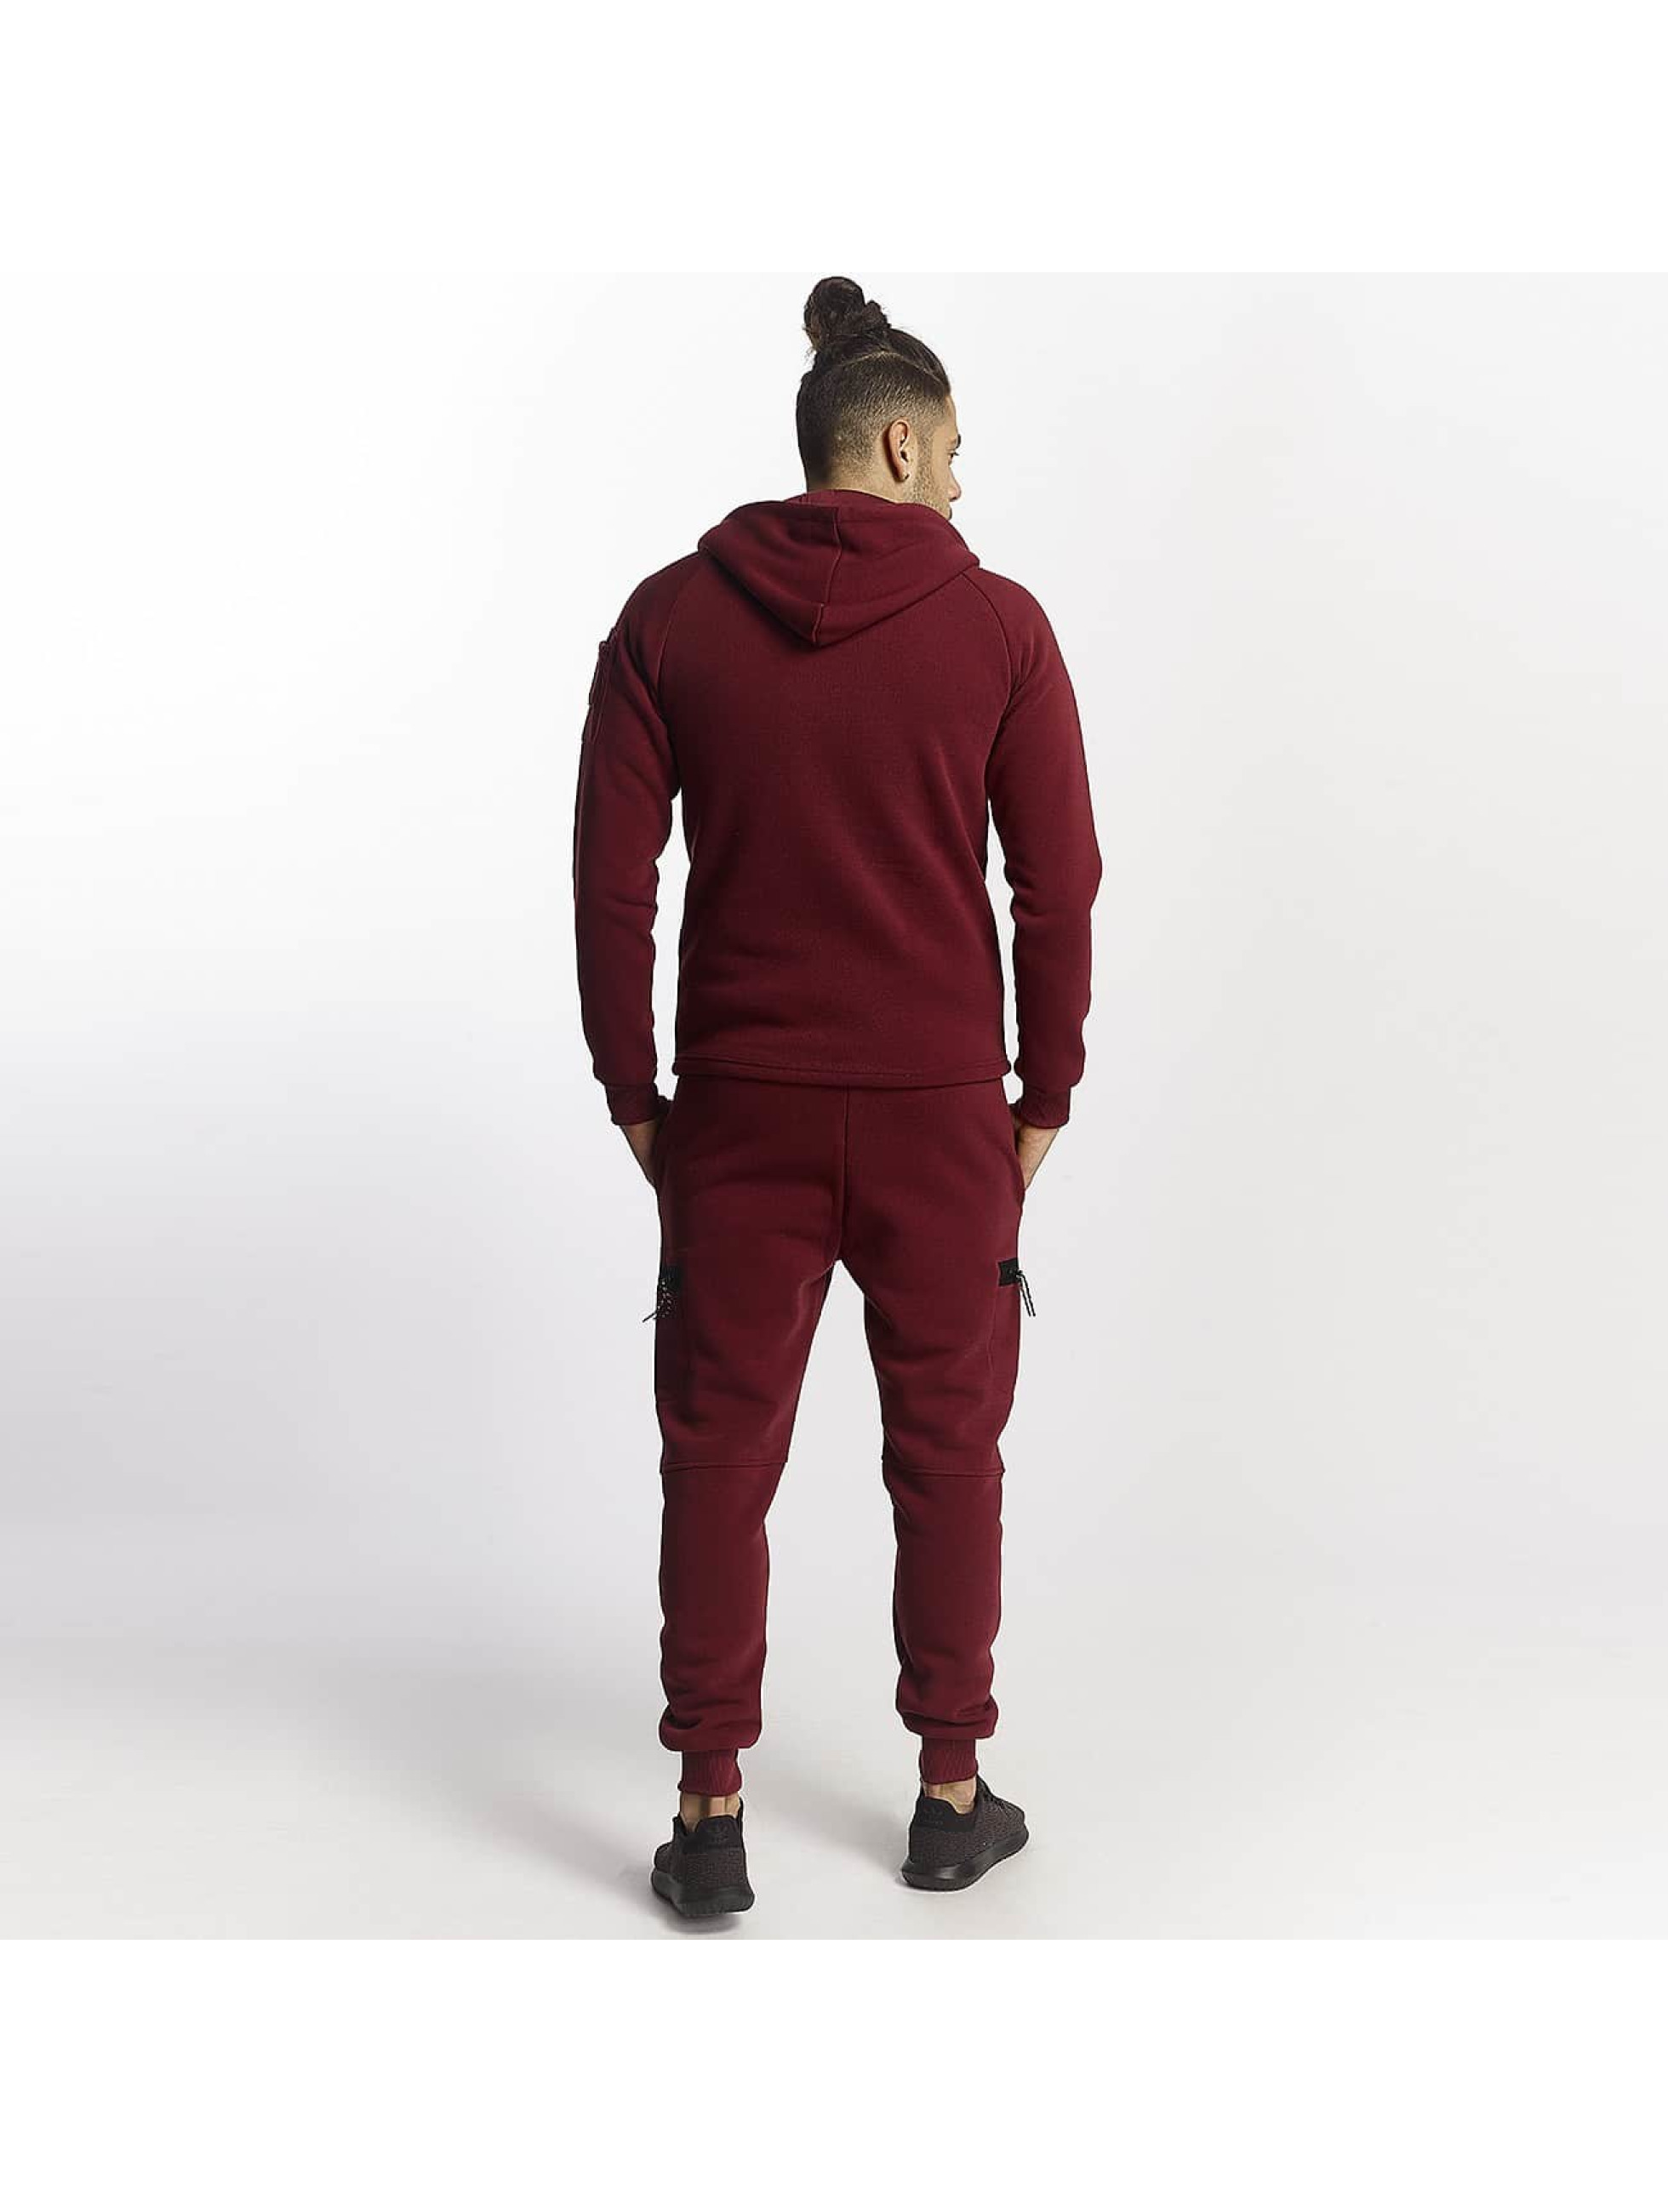 Aarhon Ensemble & Survêtement Aarhon Track Suit rouge